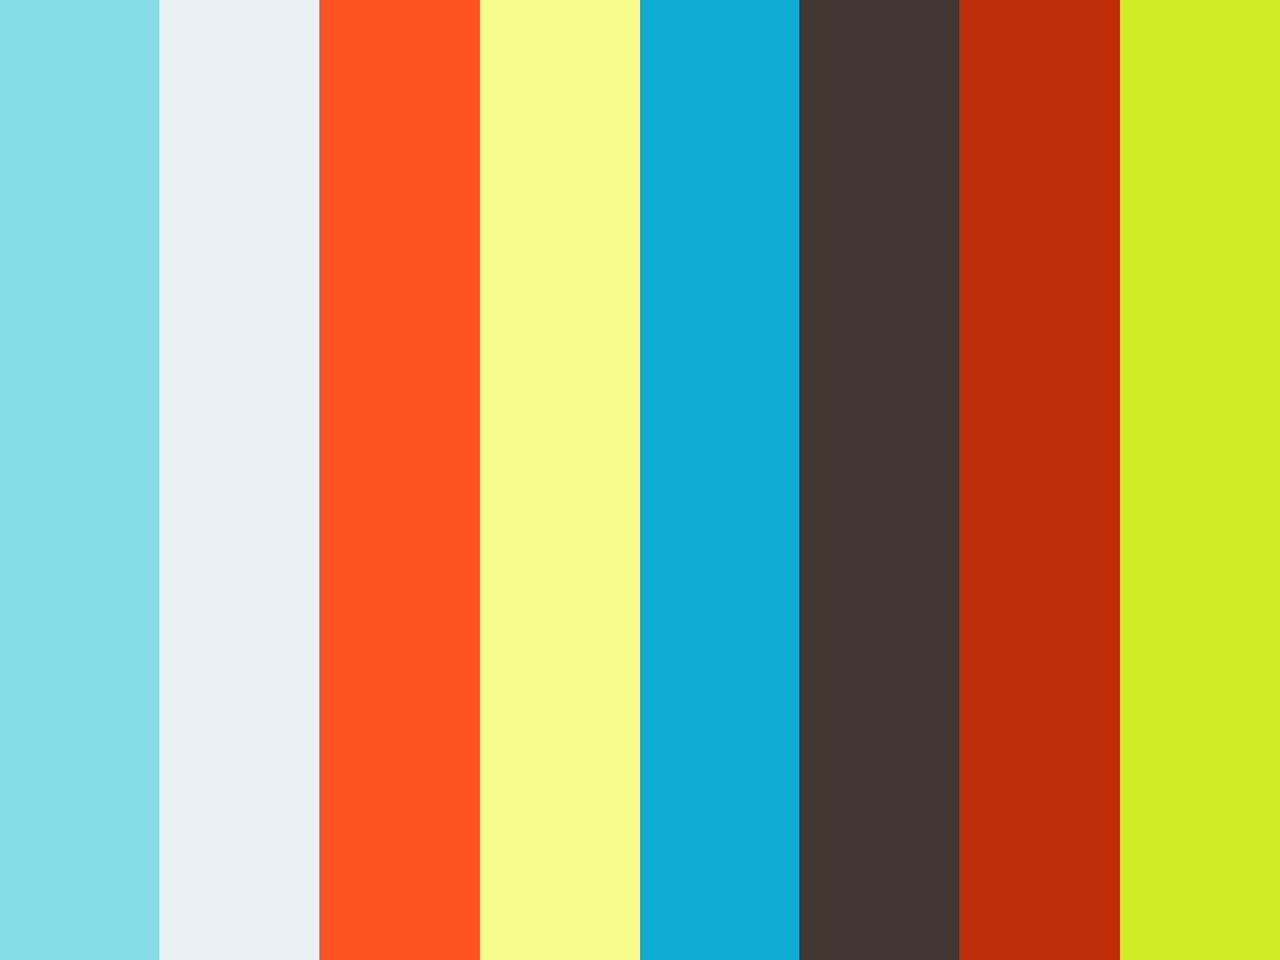 401: 2.6 - Identifying Lightmap UV problems